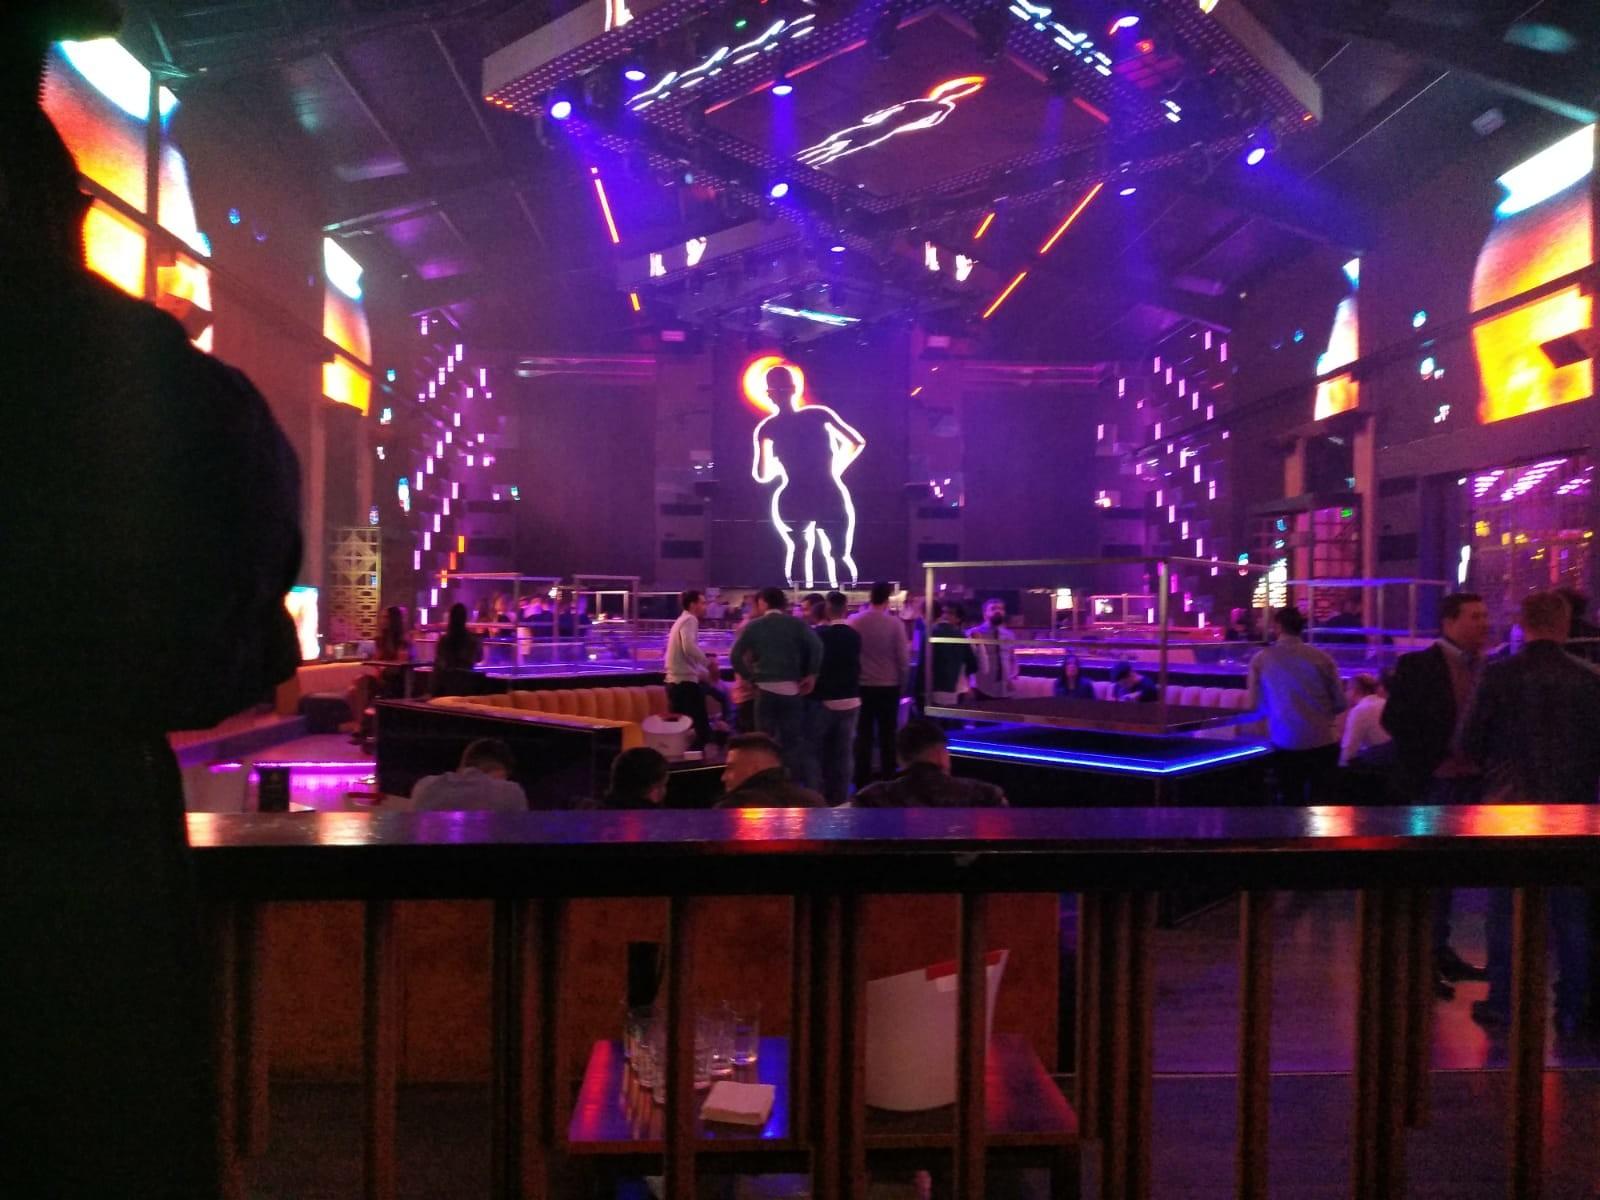 discoteca-bamboo-club-53578394c796426850